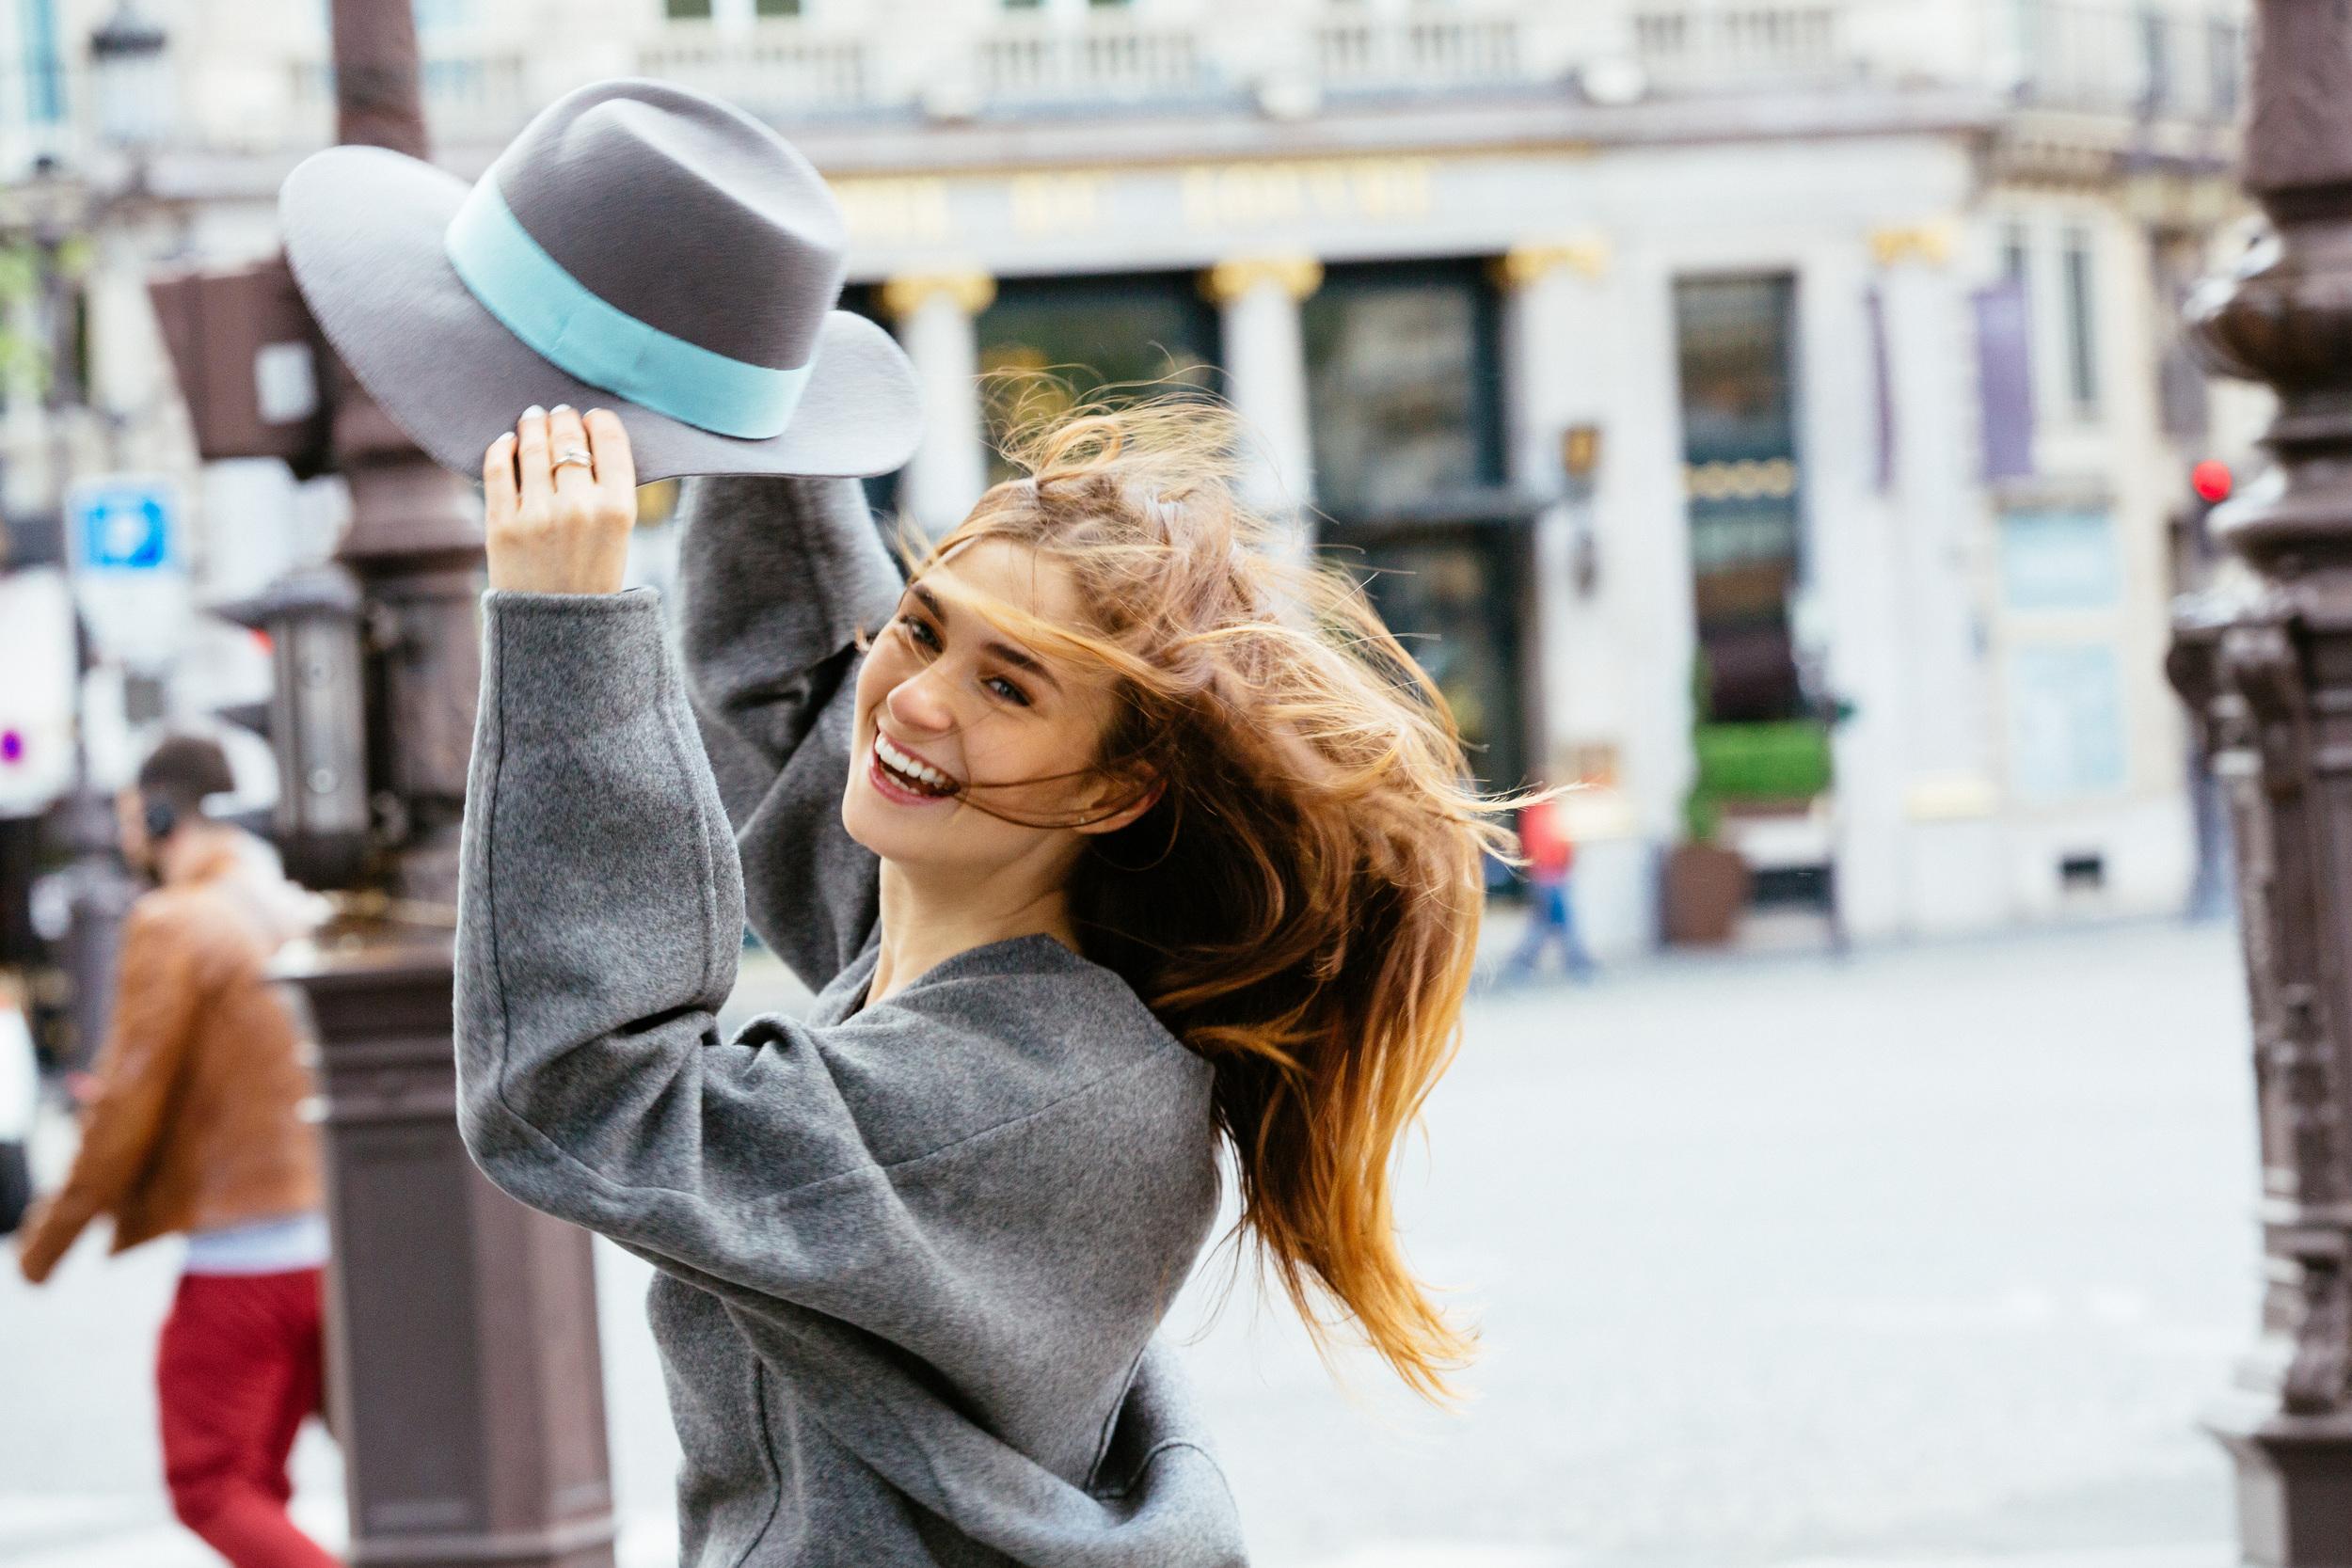 Photographer in Paris, portrait, Brand, Lookbook, Iheartparisfr